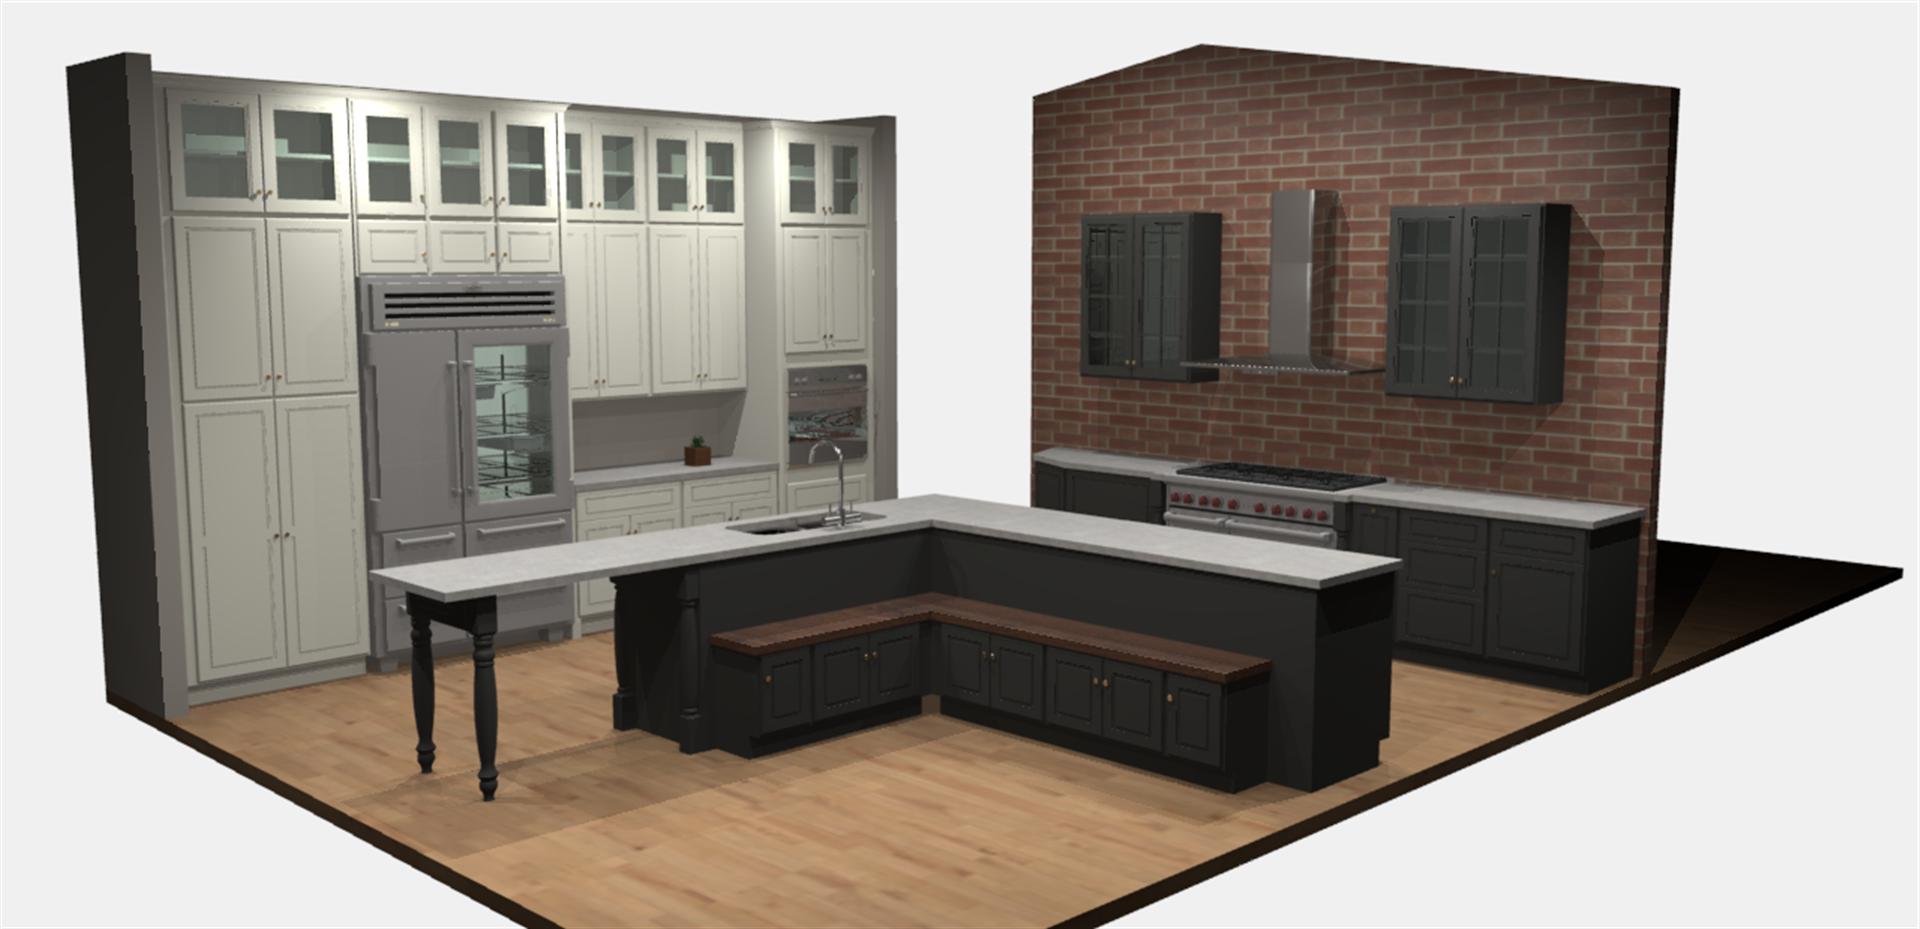 Phyllis Brick Wall Kitchen Renders